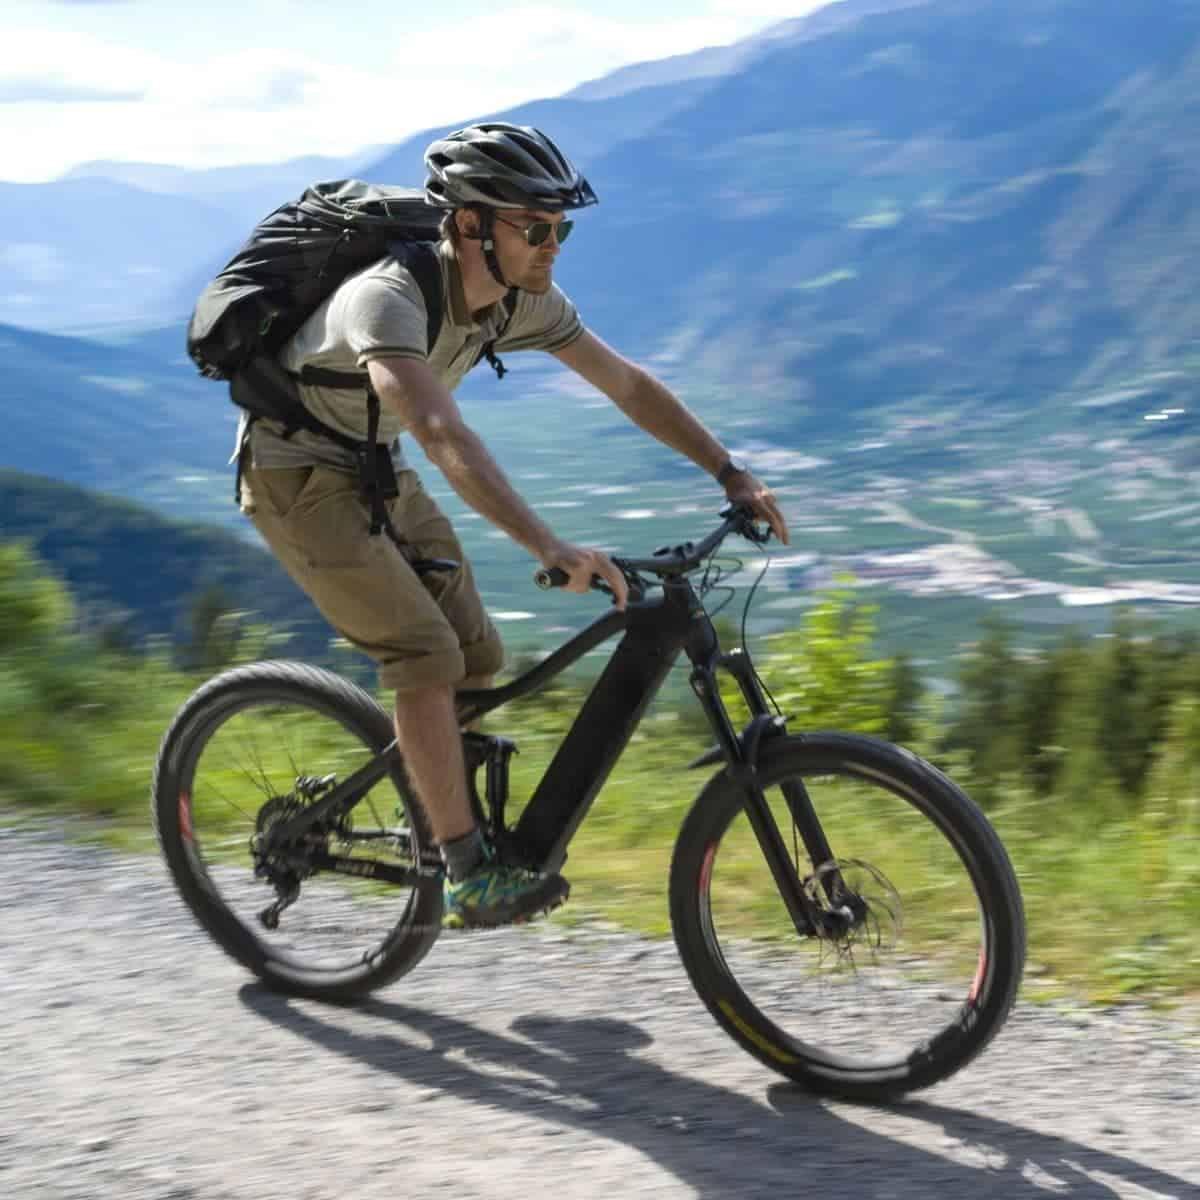 Person riding an electric bike on a mountain trail.